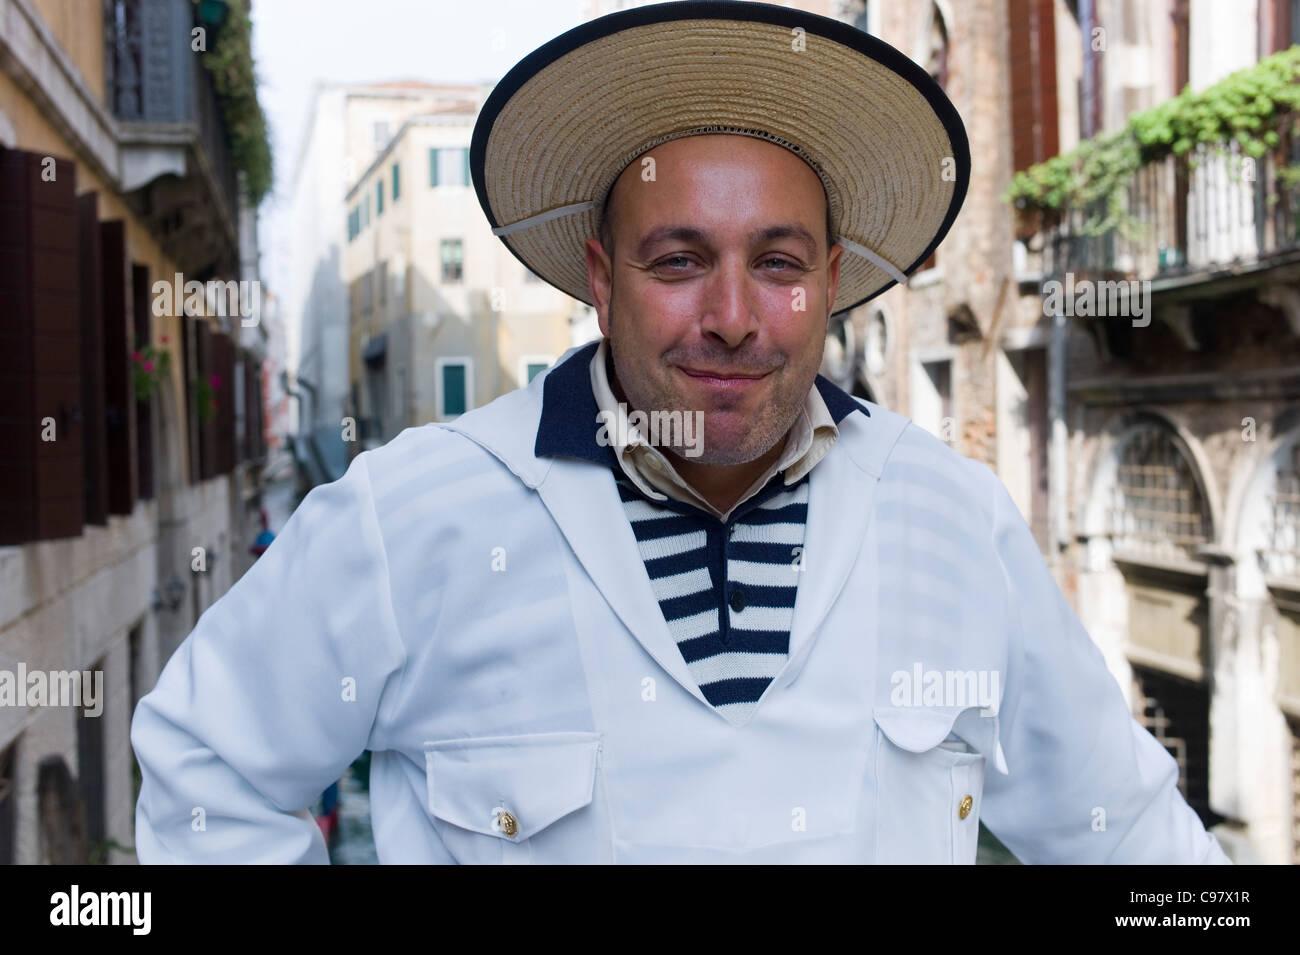 Cheerful gondolier, Gondolieri wearing traditional clothes, Venice, Veneto, Italy, Europe - Stock Image